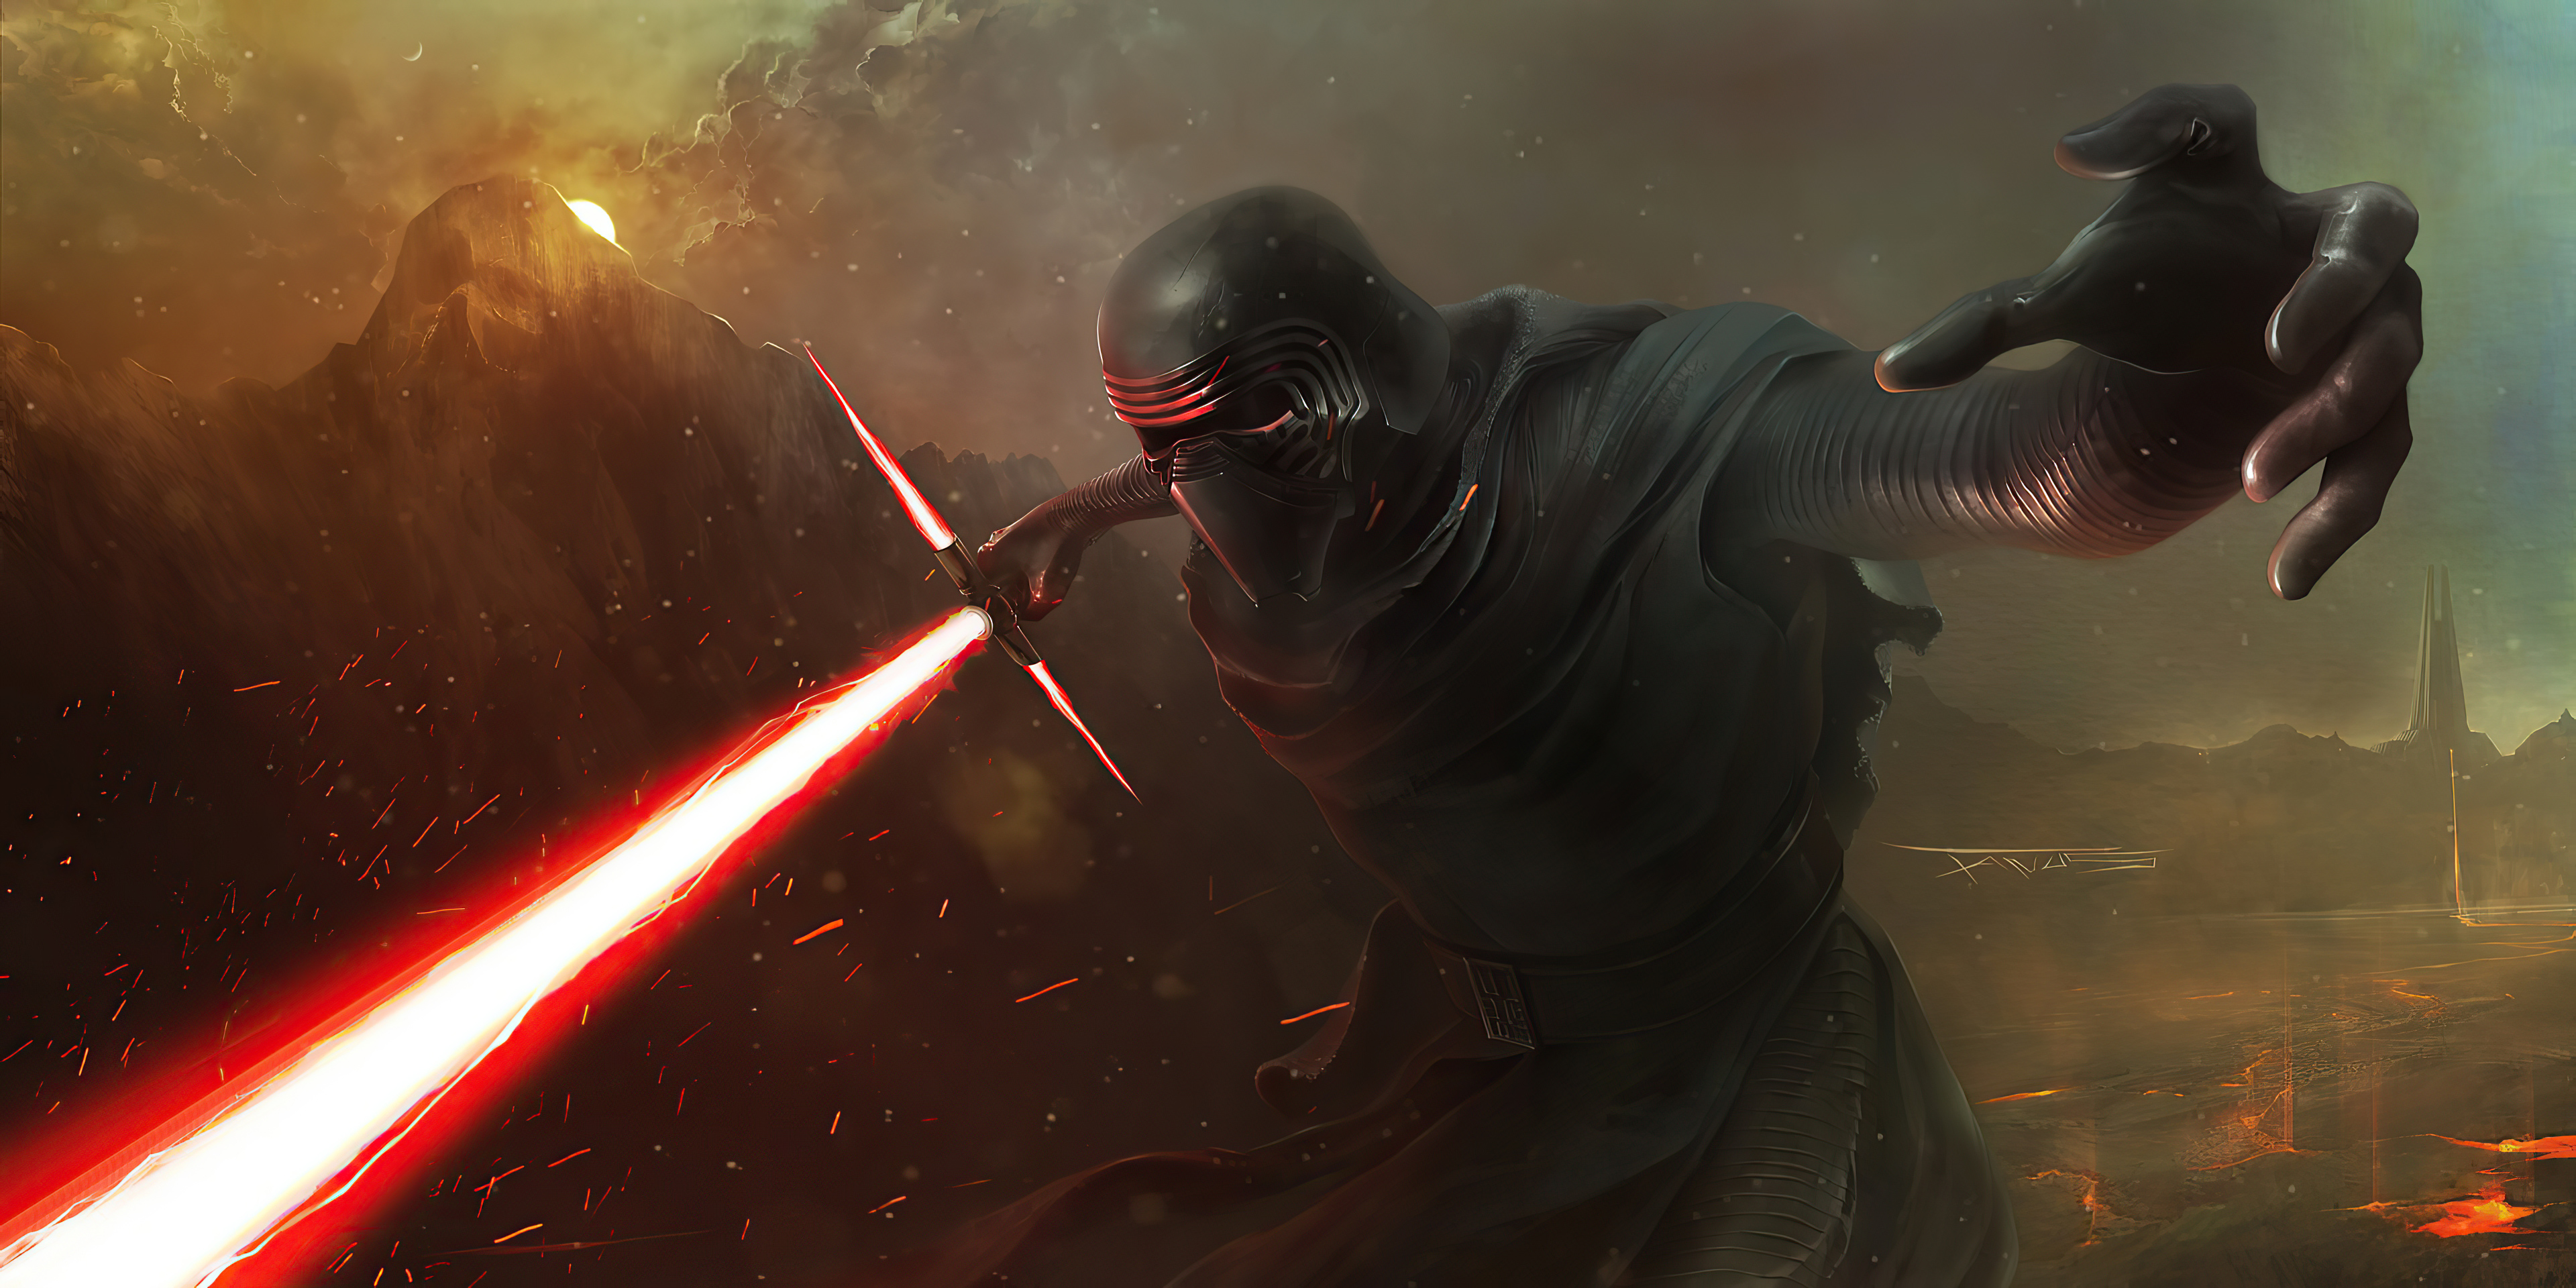 Fondos de pantalla Kylo Ren de Star Wars 2020